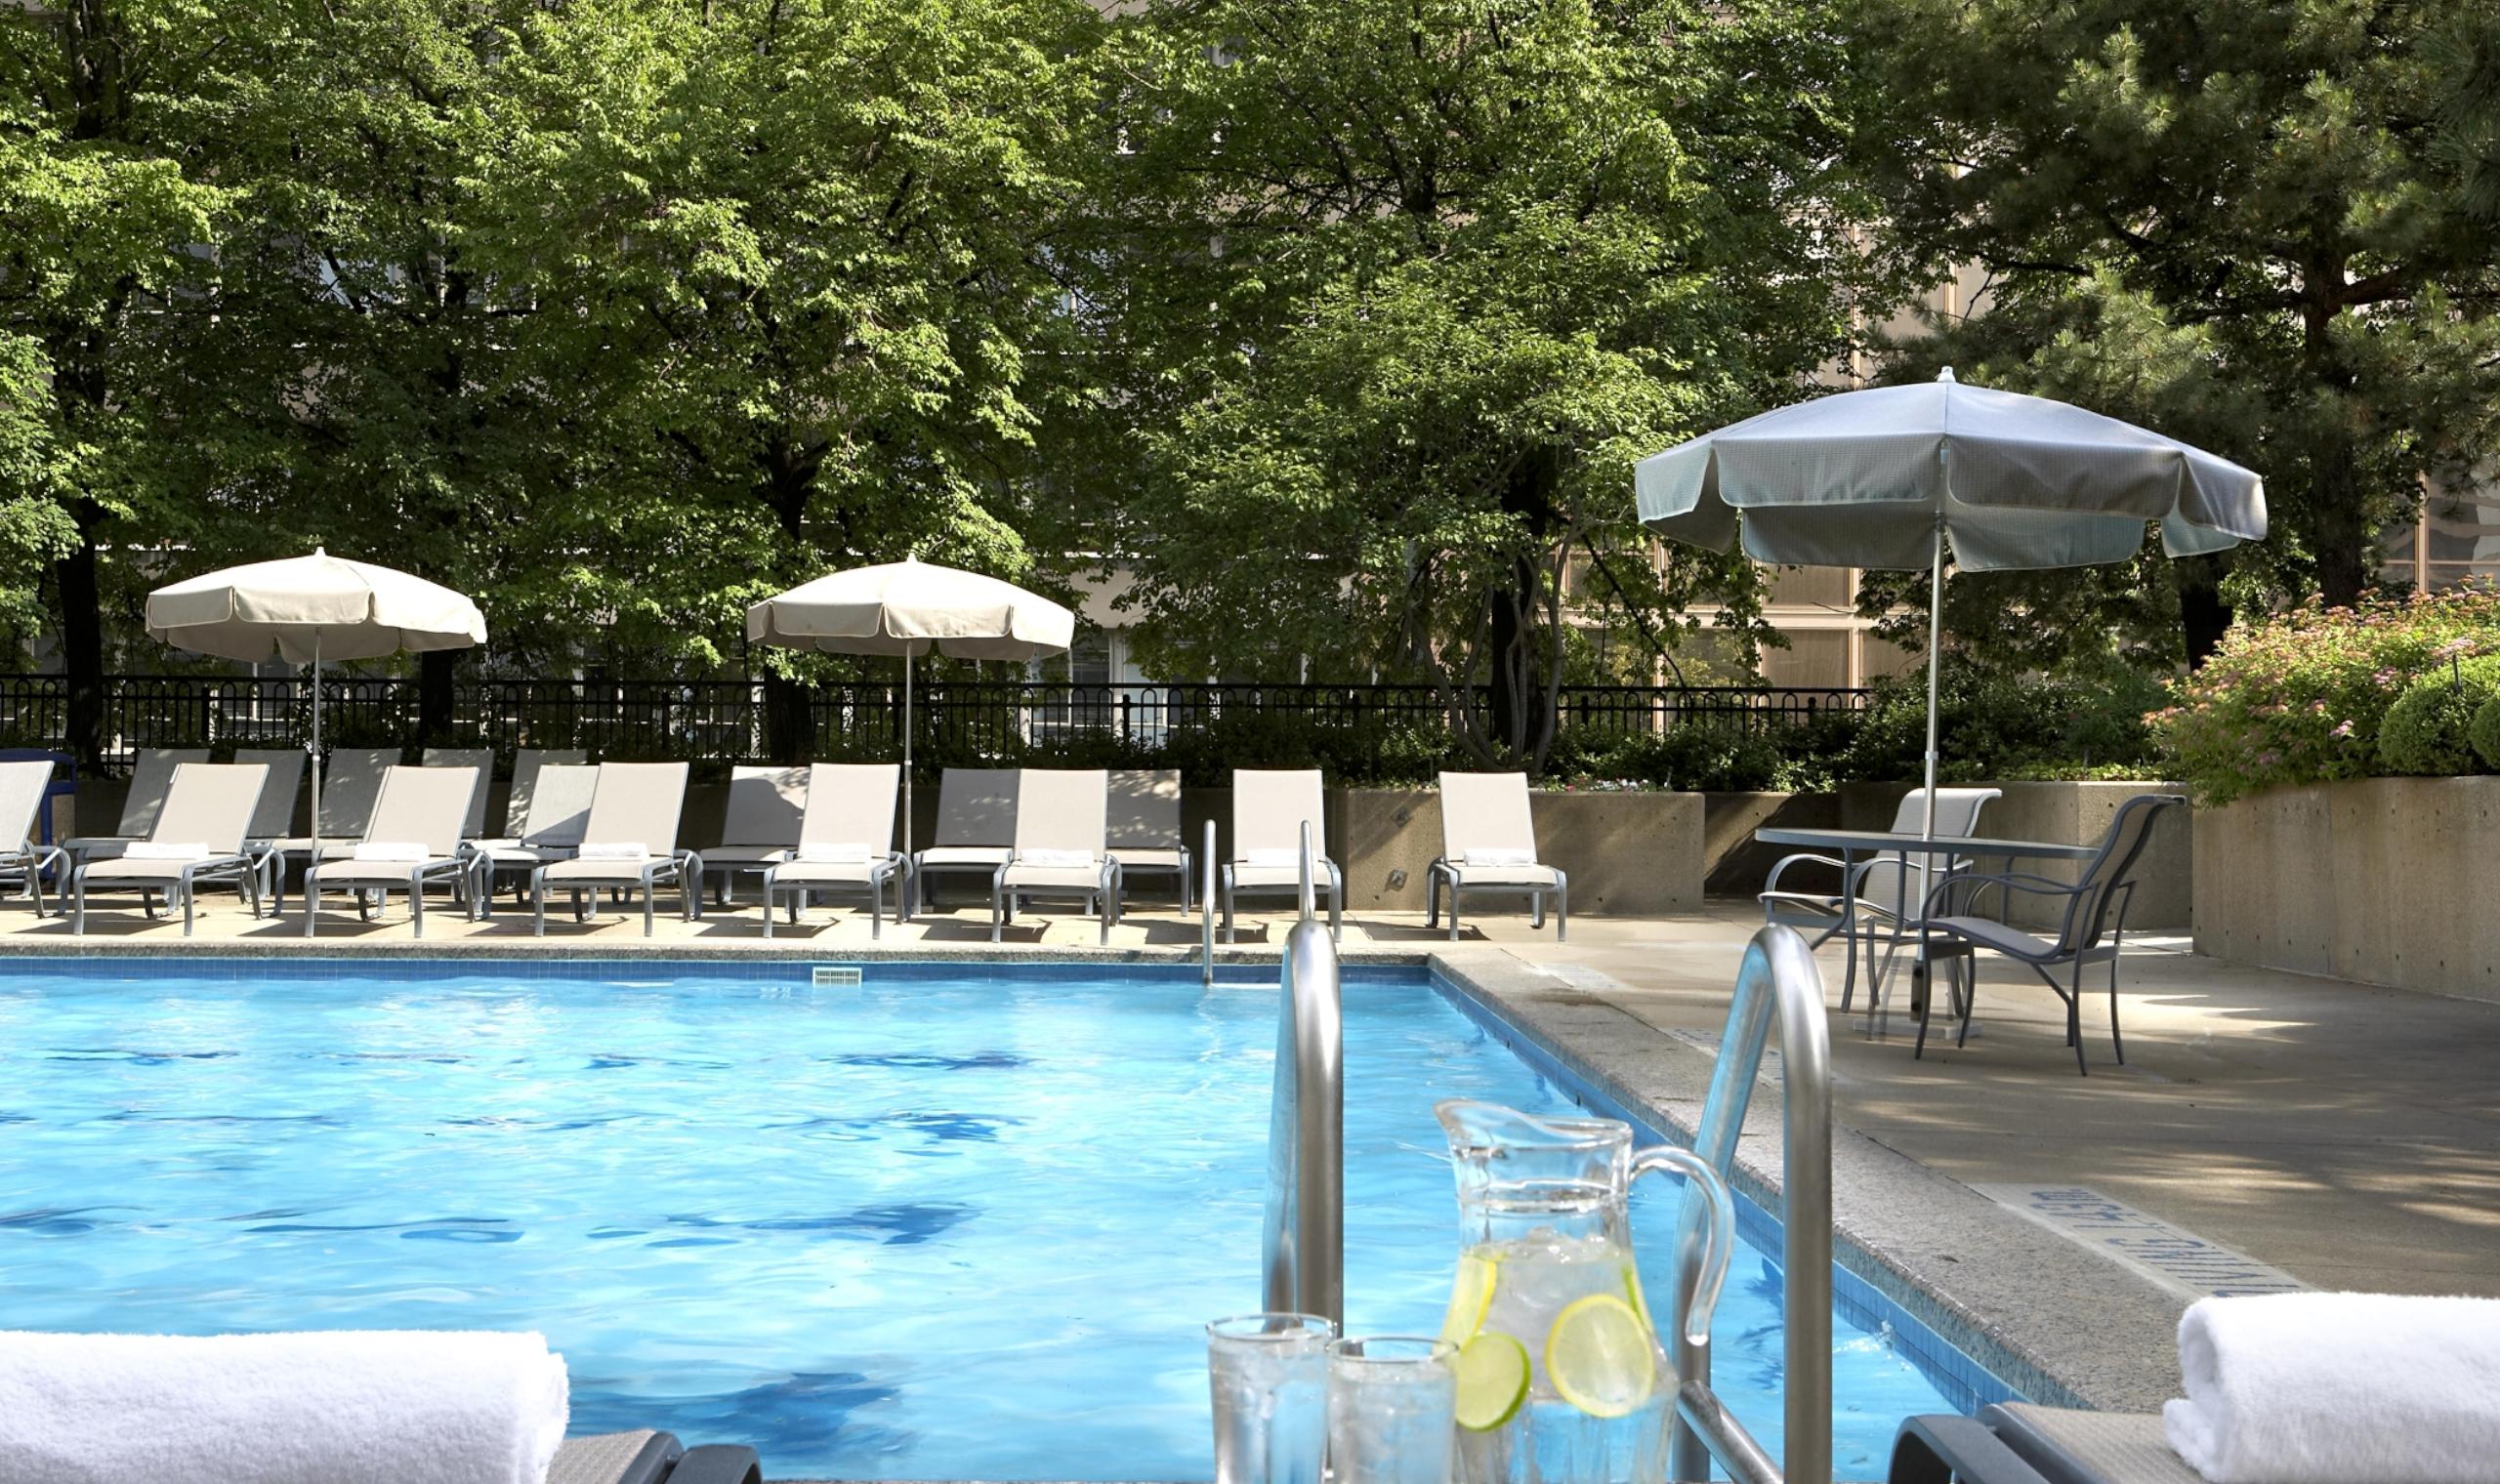 Sheraton centre toronto toronto canadian affair - Outdoor swimming pools north west ...